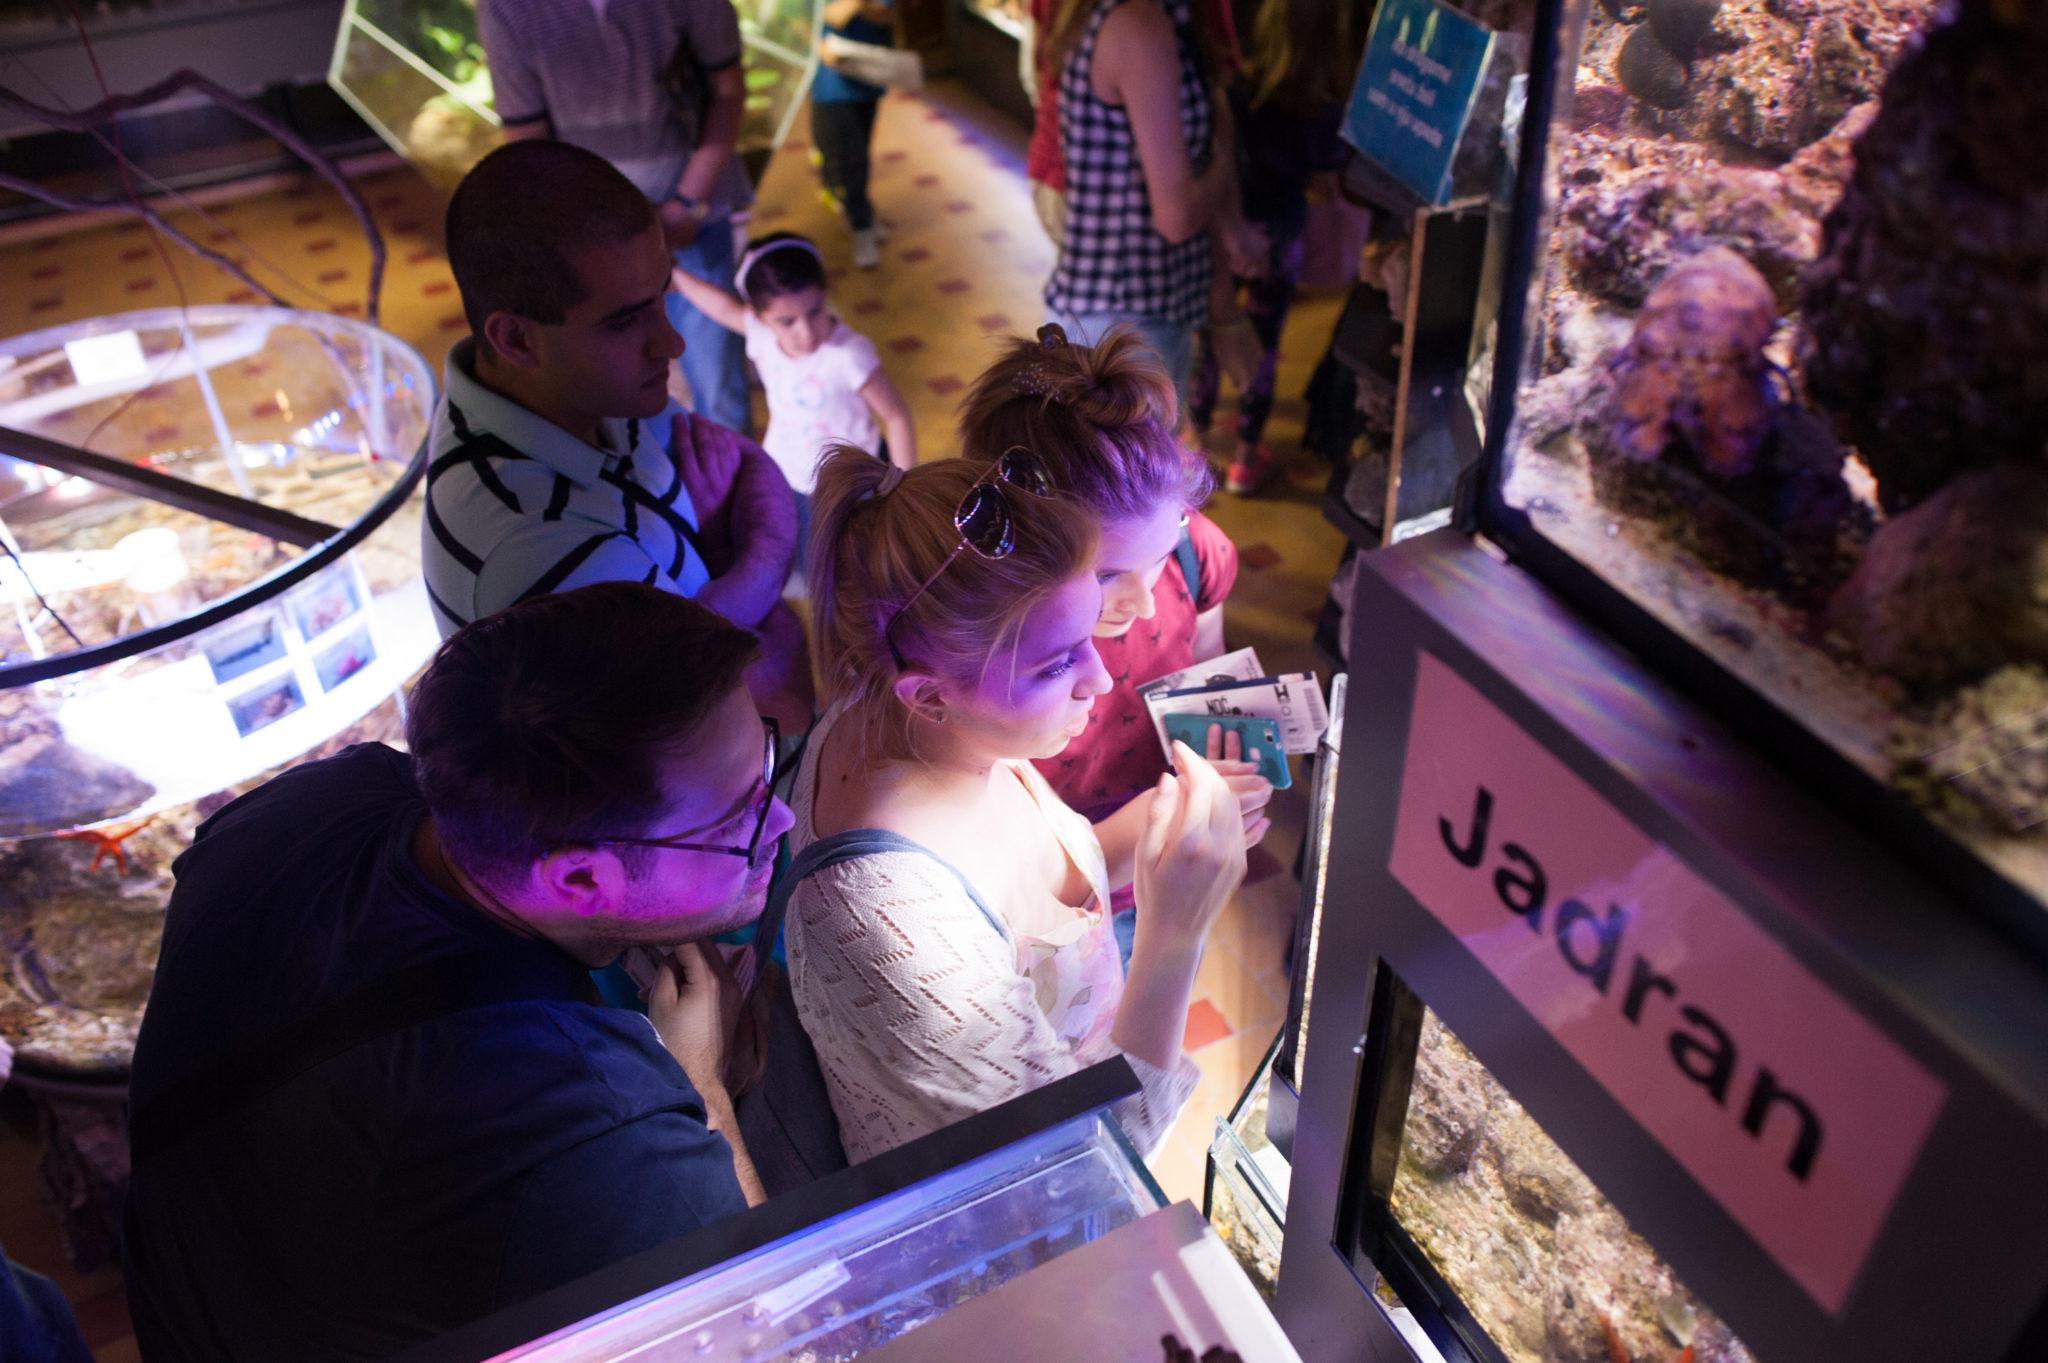 Javni akvarijum i tropikarijum NM2016 014